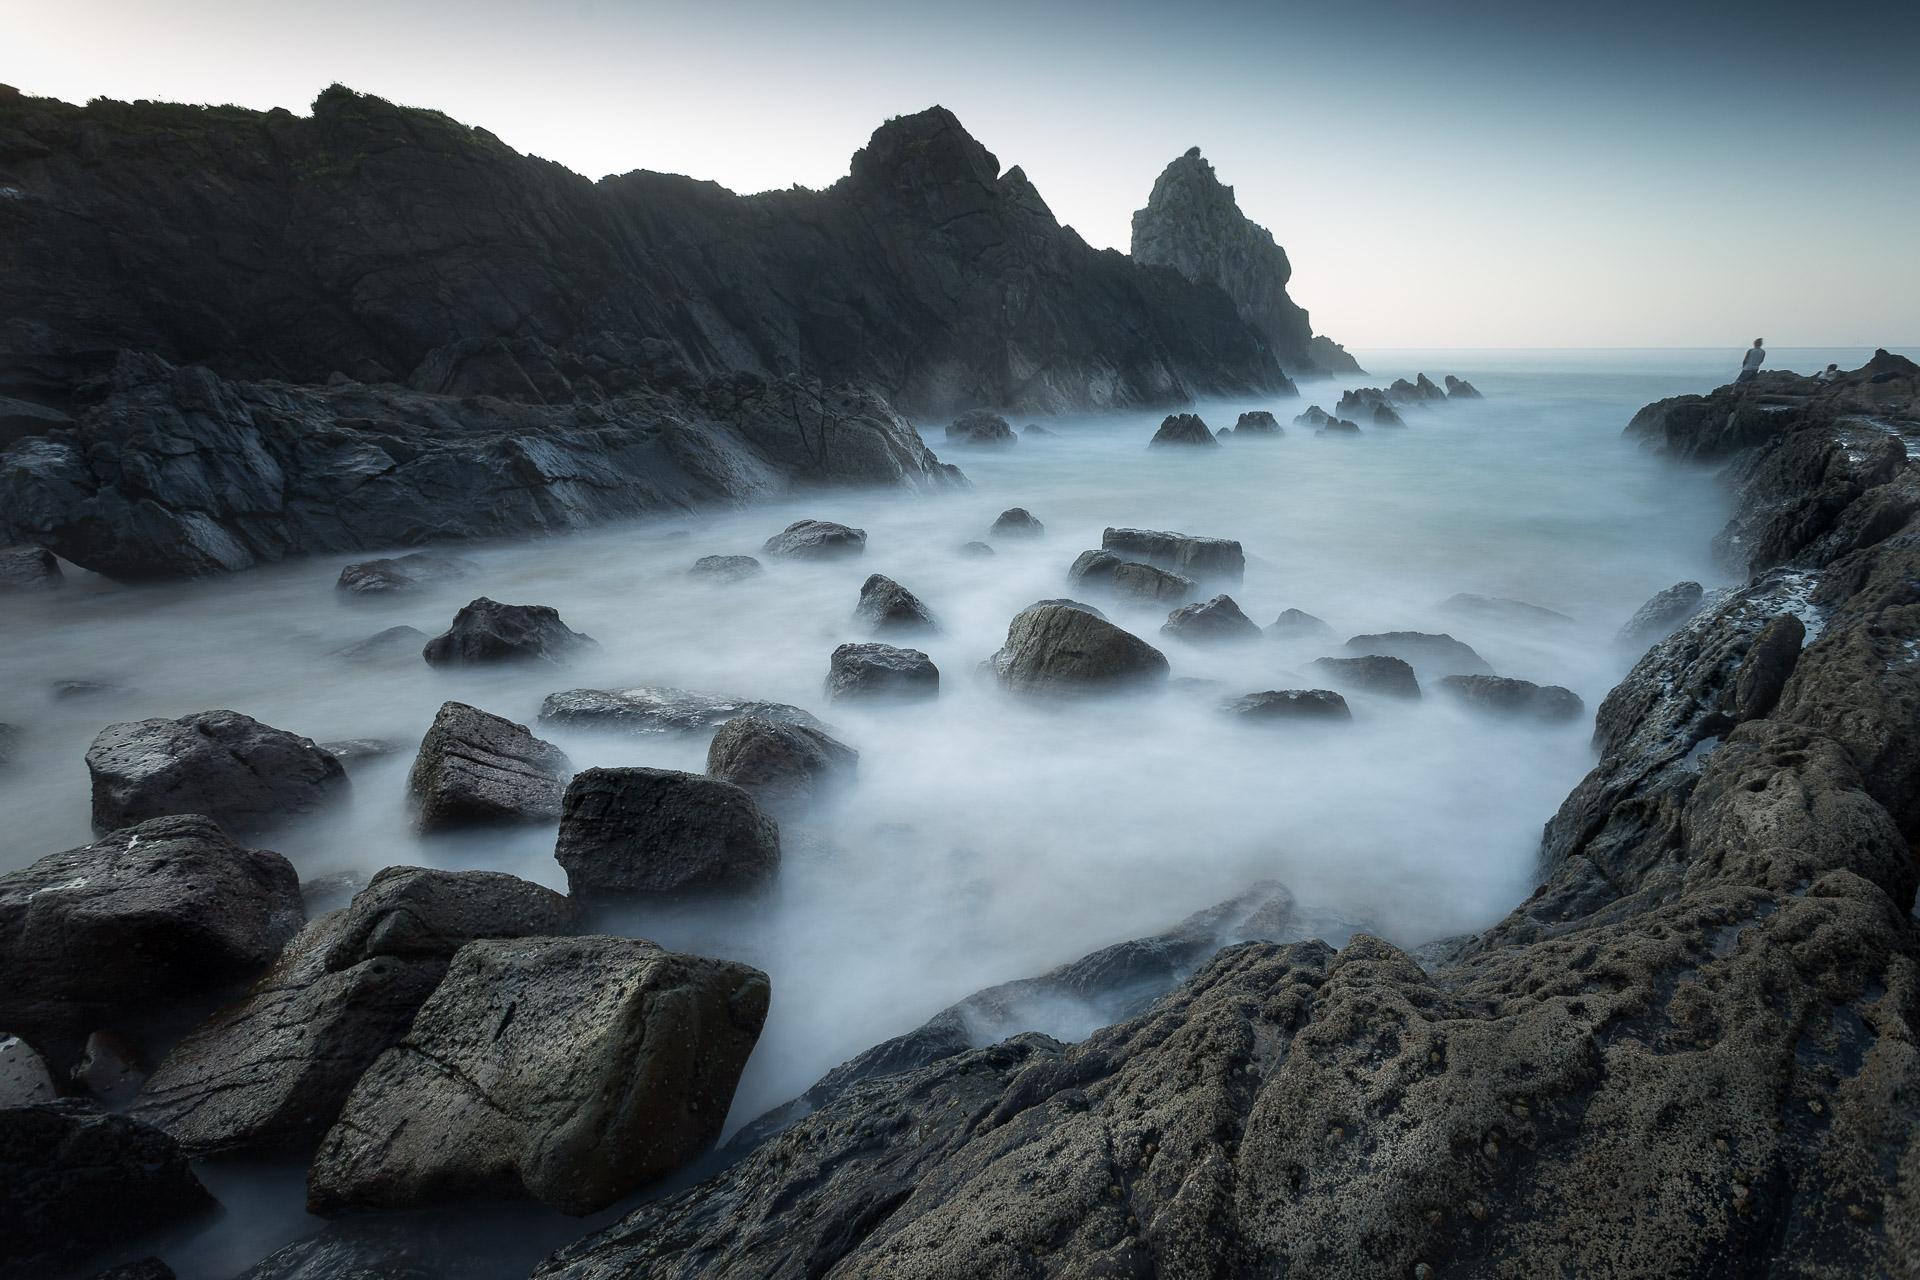 Fotografía de paisaje Playa de Laga,larga exposición, canon 6D,Danilatorre,danilatorre, Dani Latorre, daniel Latorre